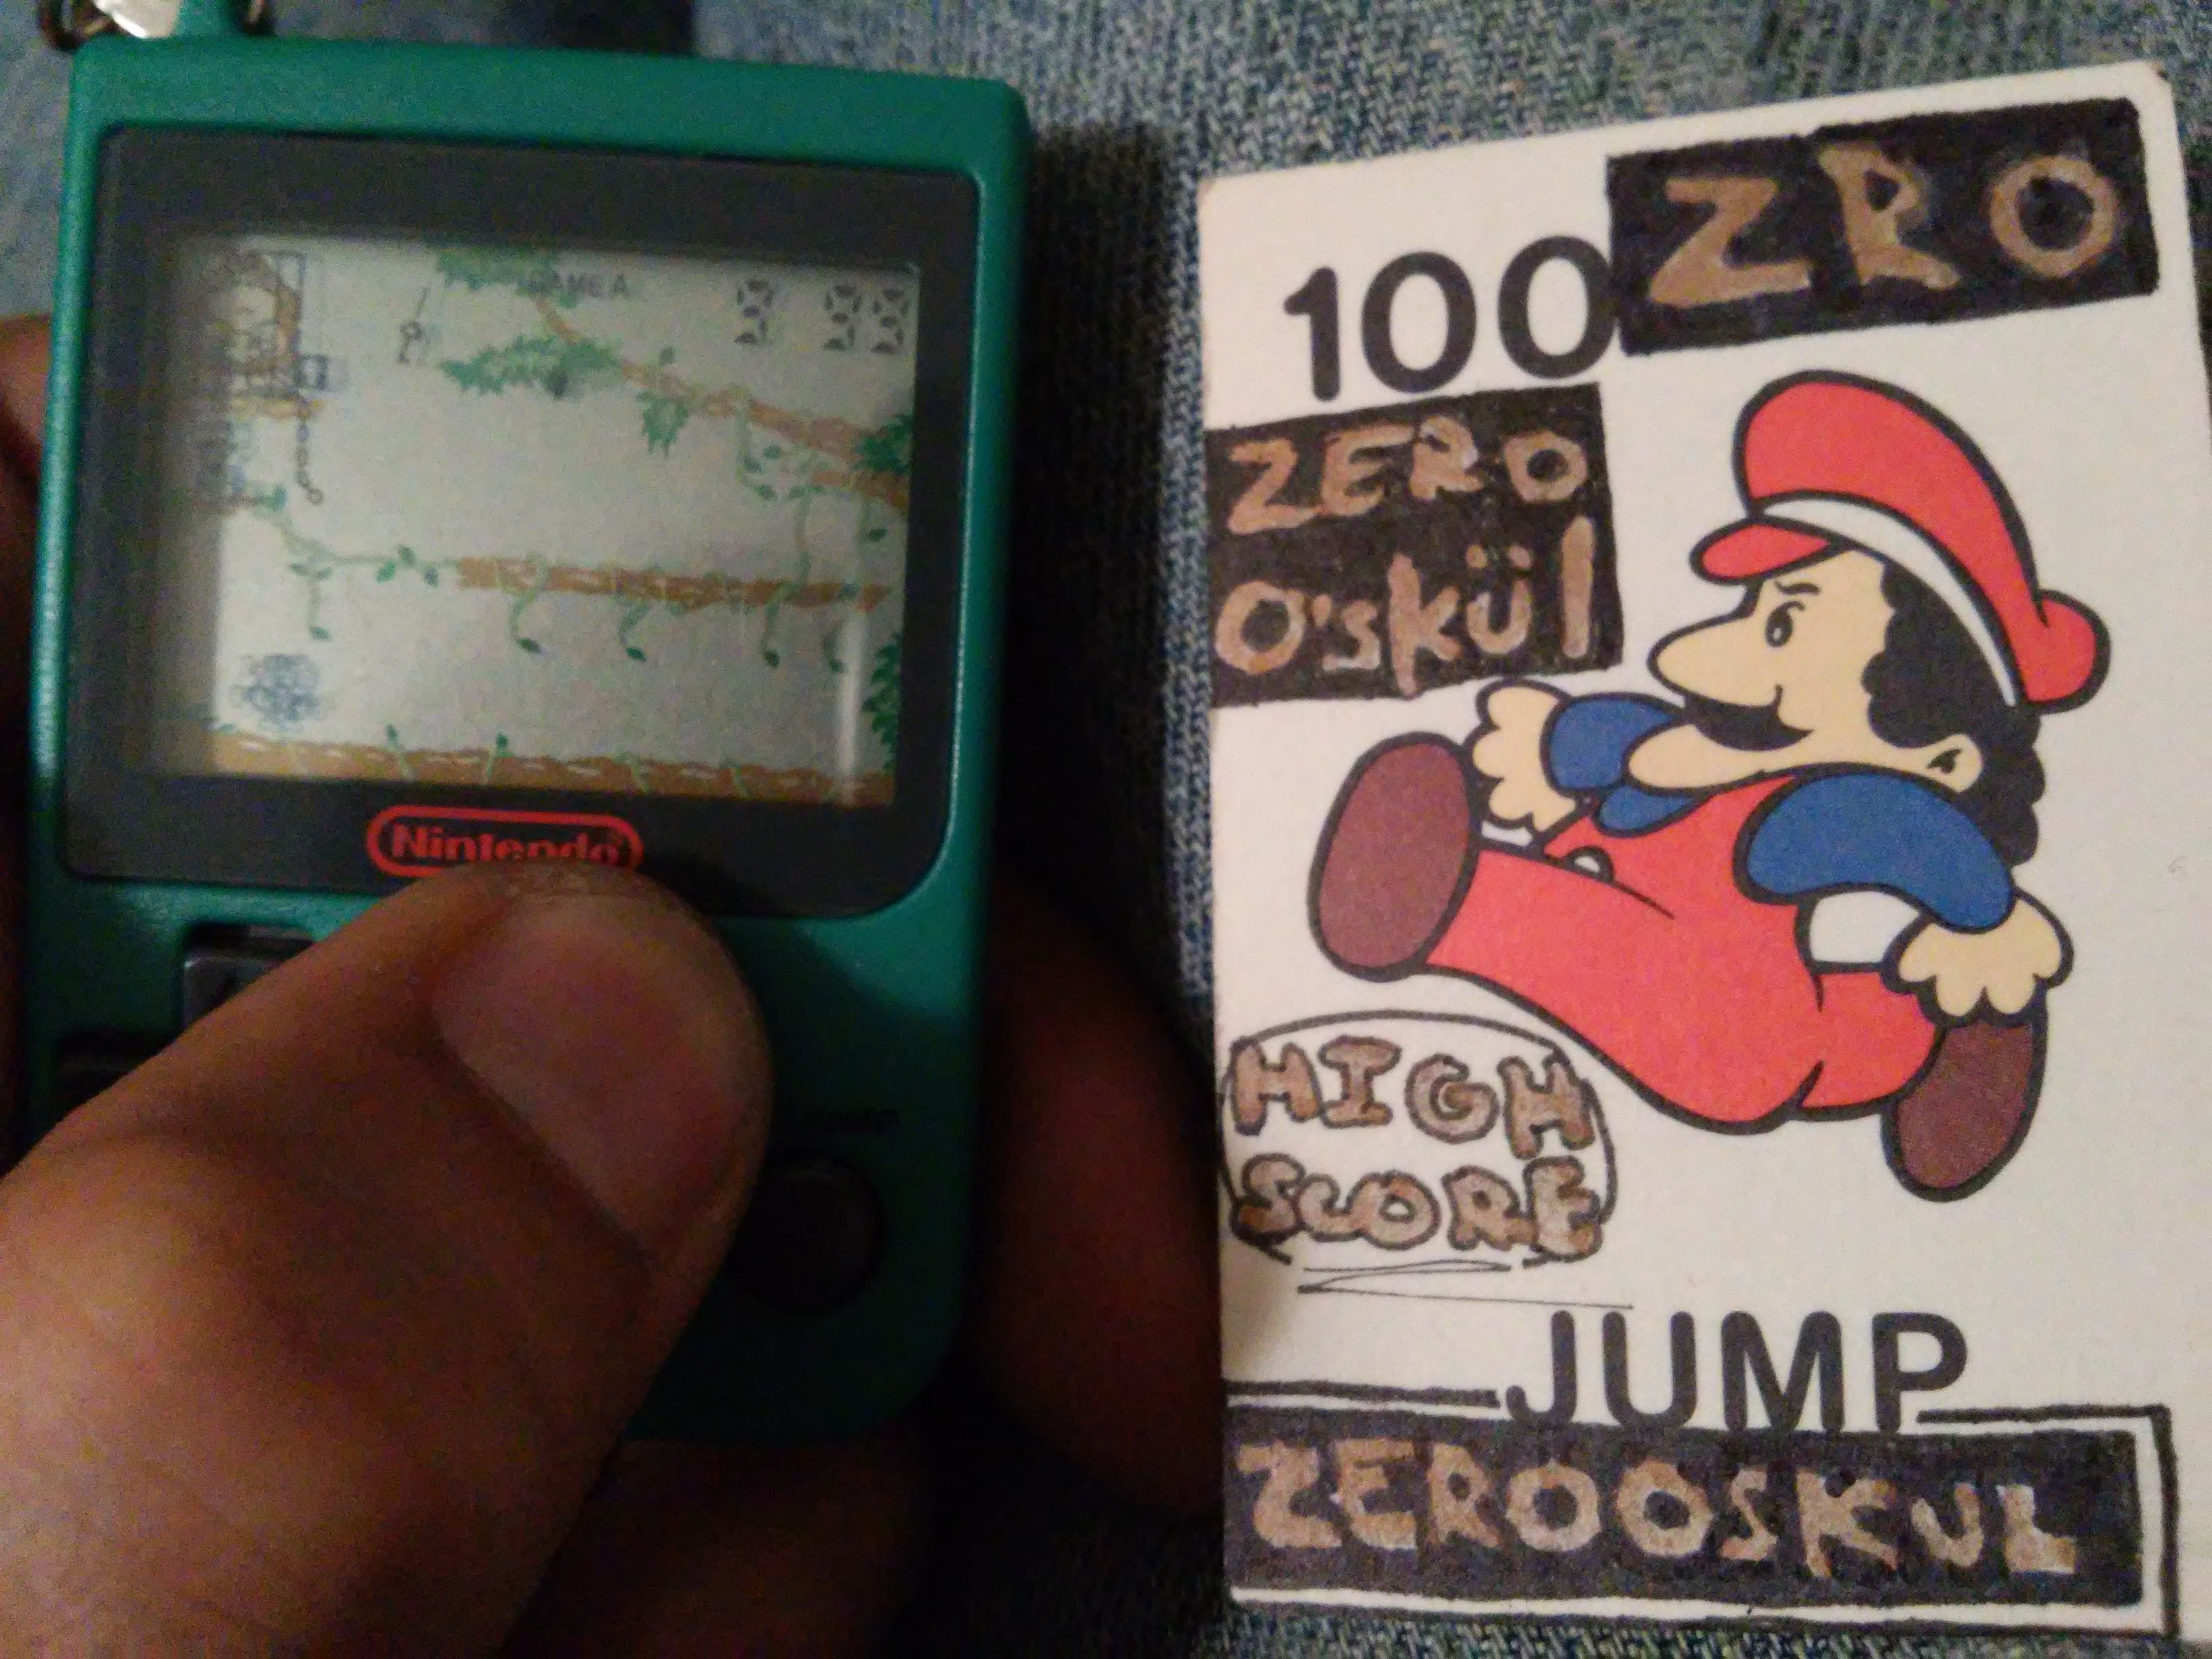 zerooskul: Nintendo Mini Classics: Donkey Kong Junior (Dedicated Handheld) 999 points on 2019-01-03 22:36:31